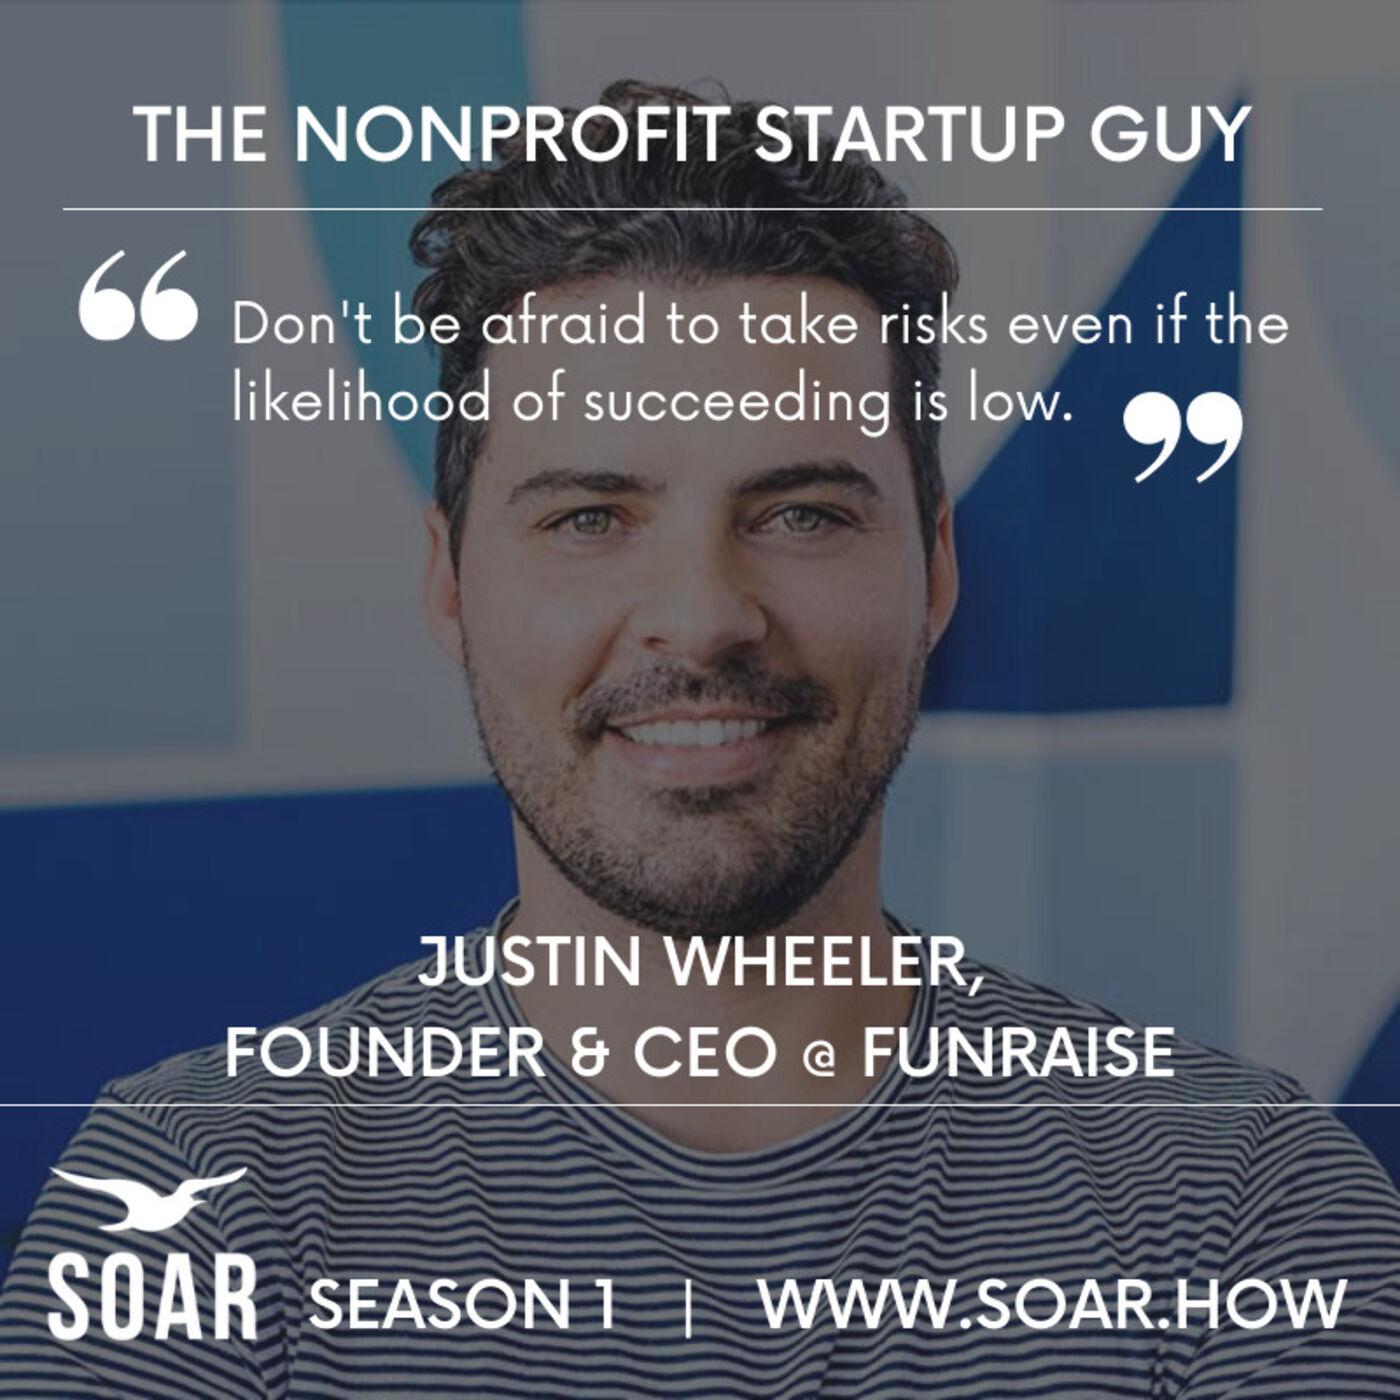 Founder Stories: Nonprofit Startups vs For-Profit Startups with Justin Wheeler